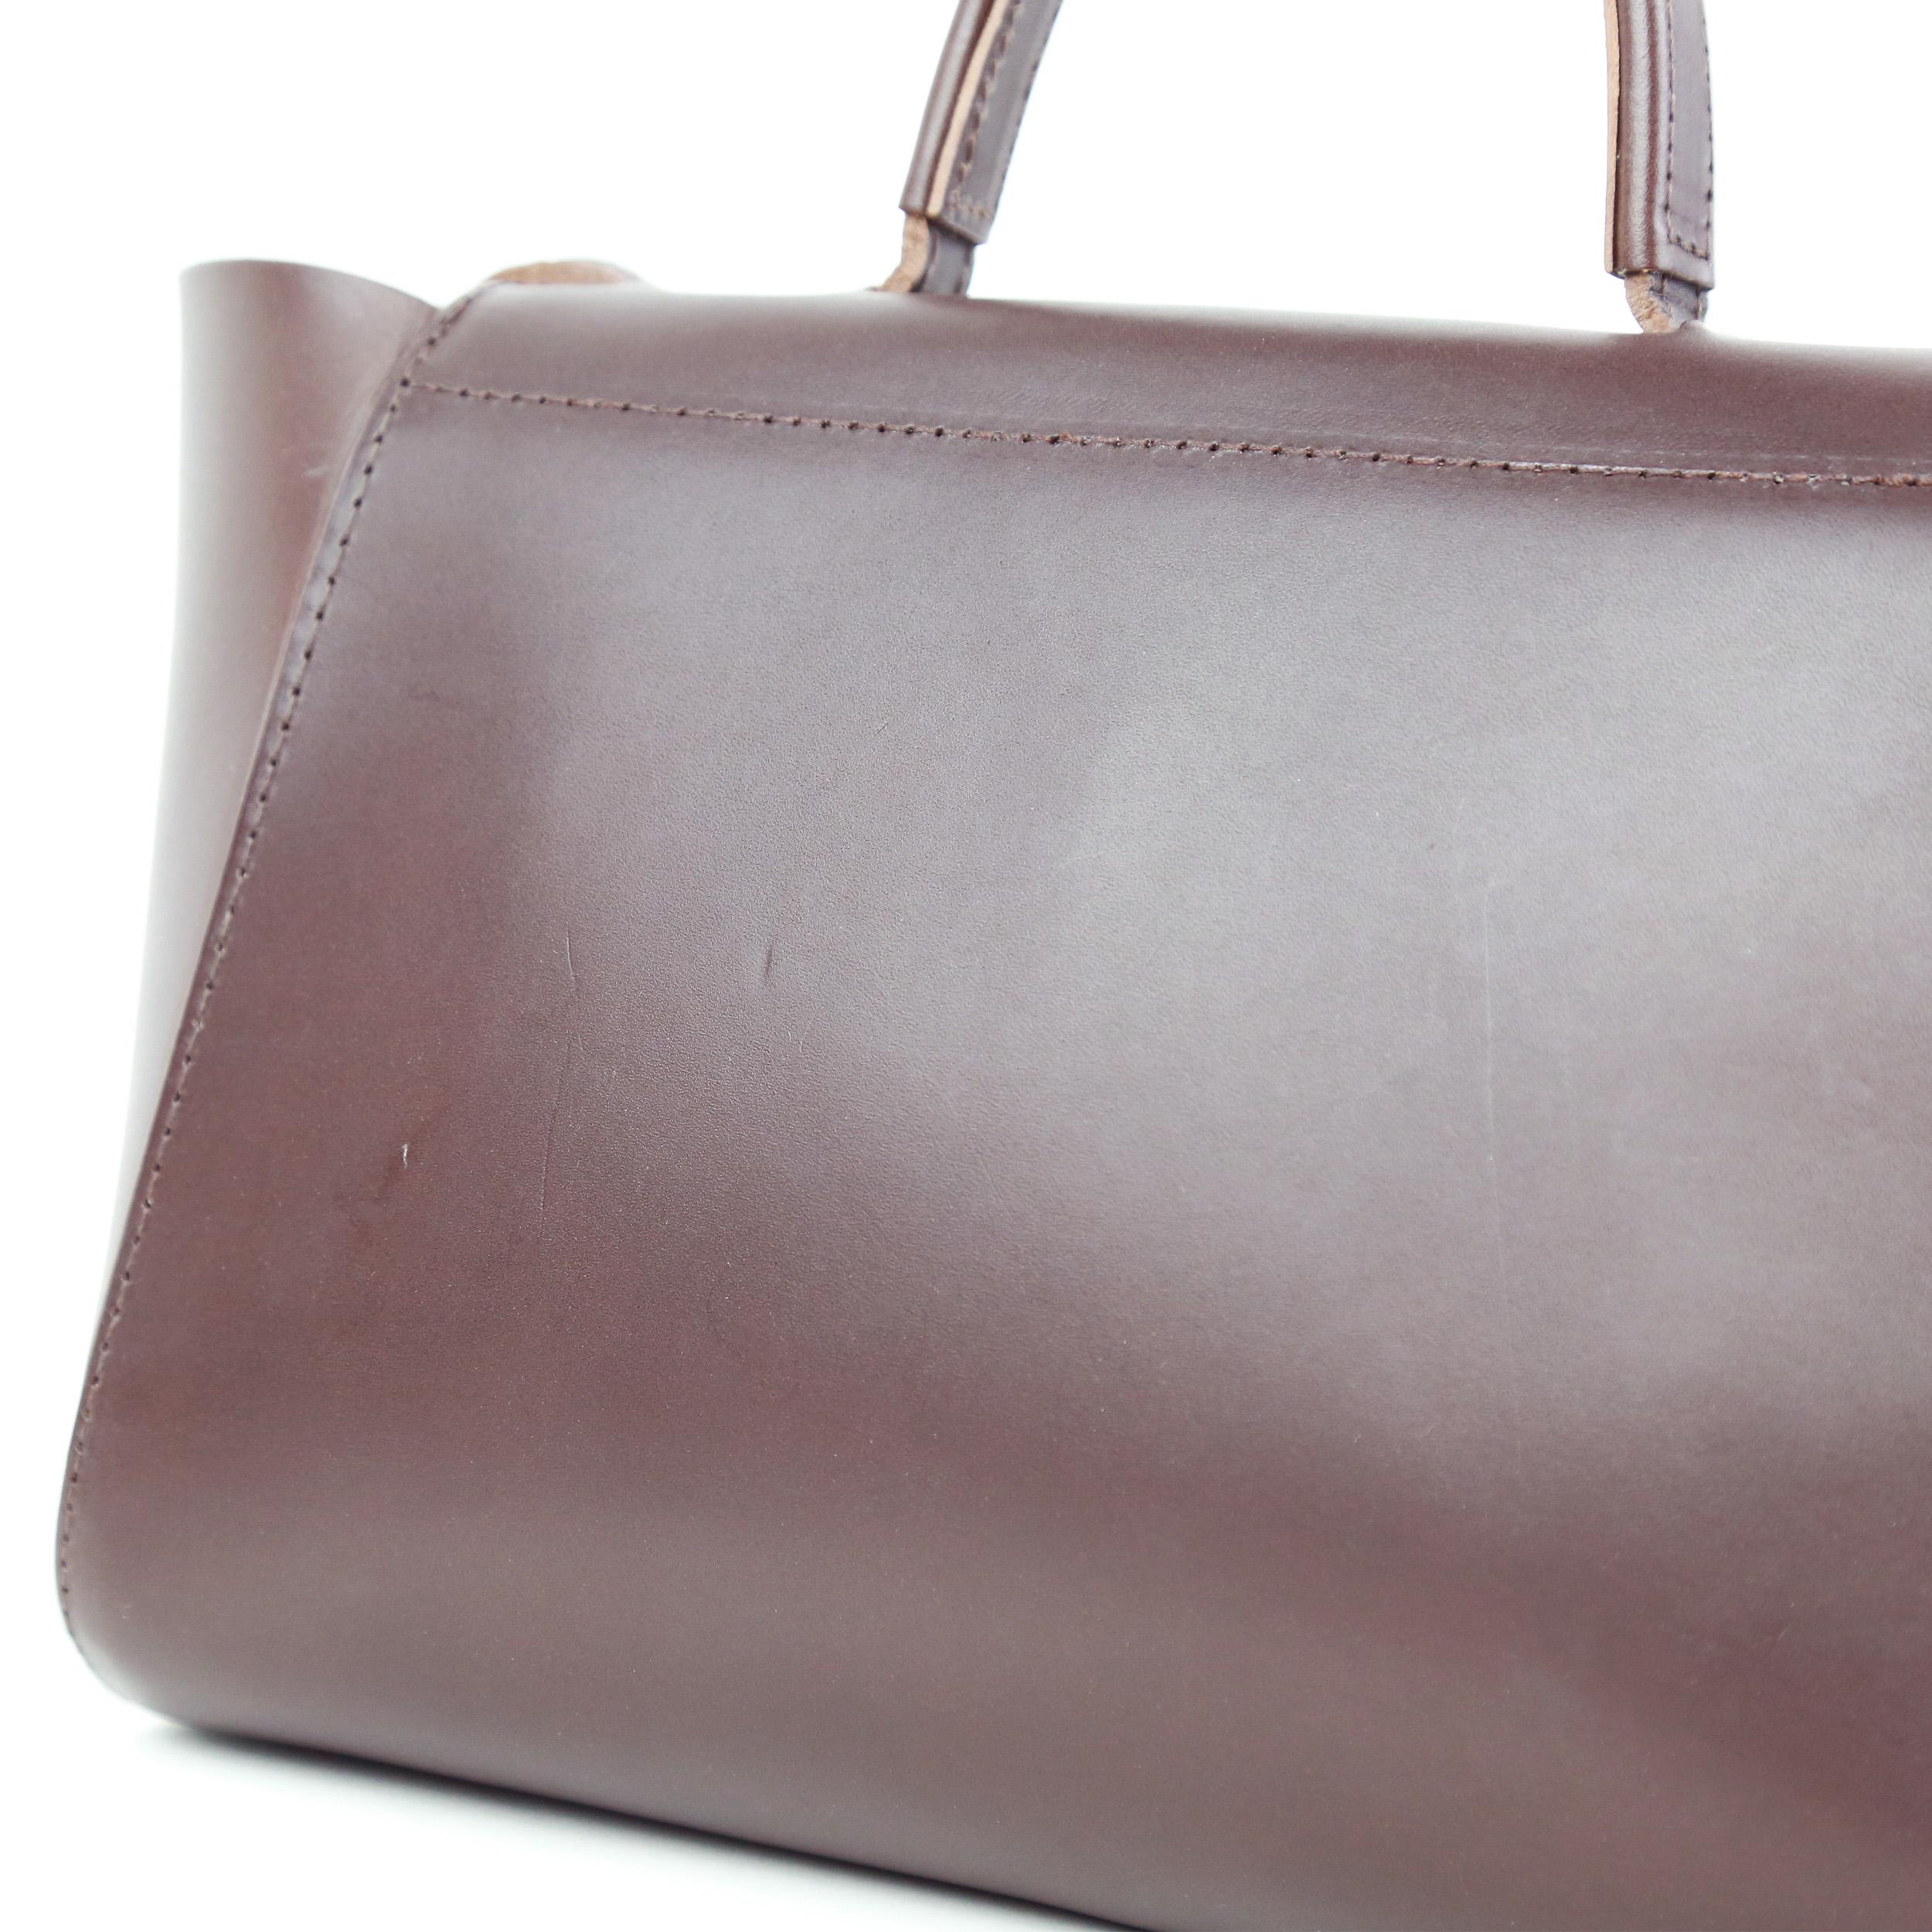 Torba-HEIDA Small Top Handle Bag Dark Brown-3